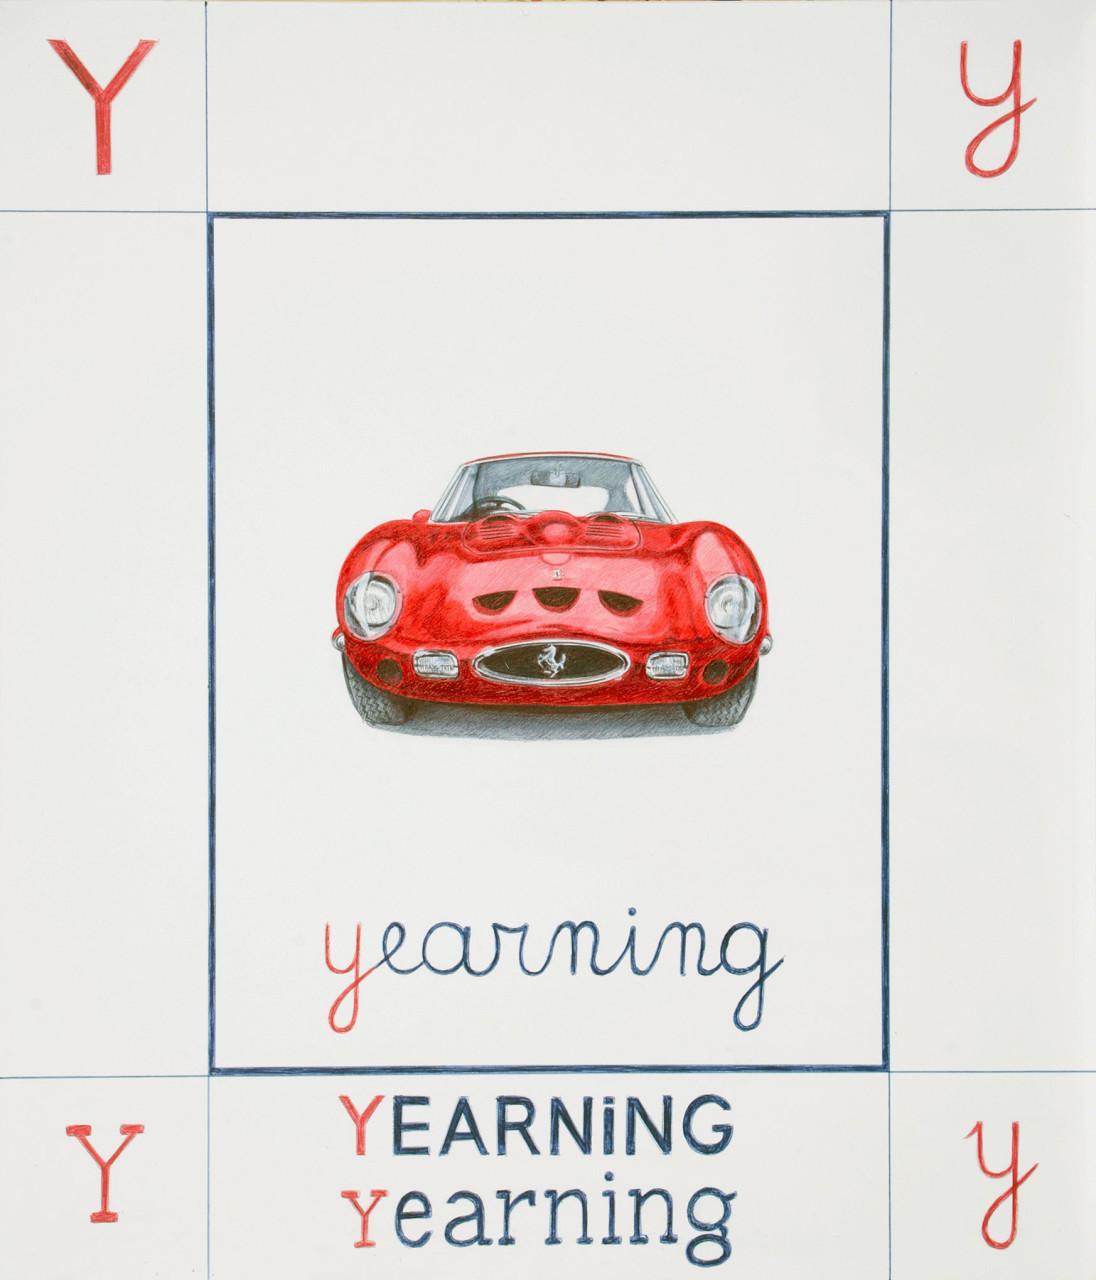 01Y-yearning_bassa